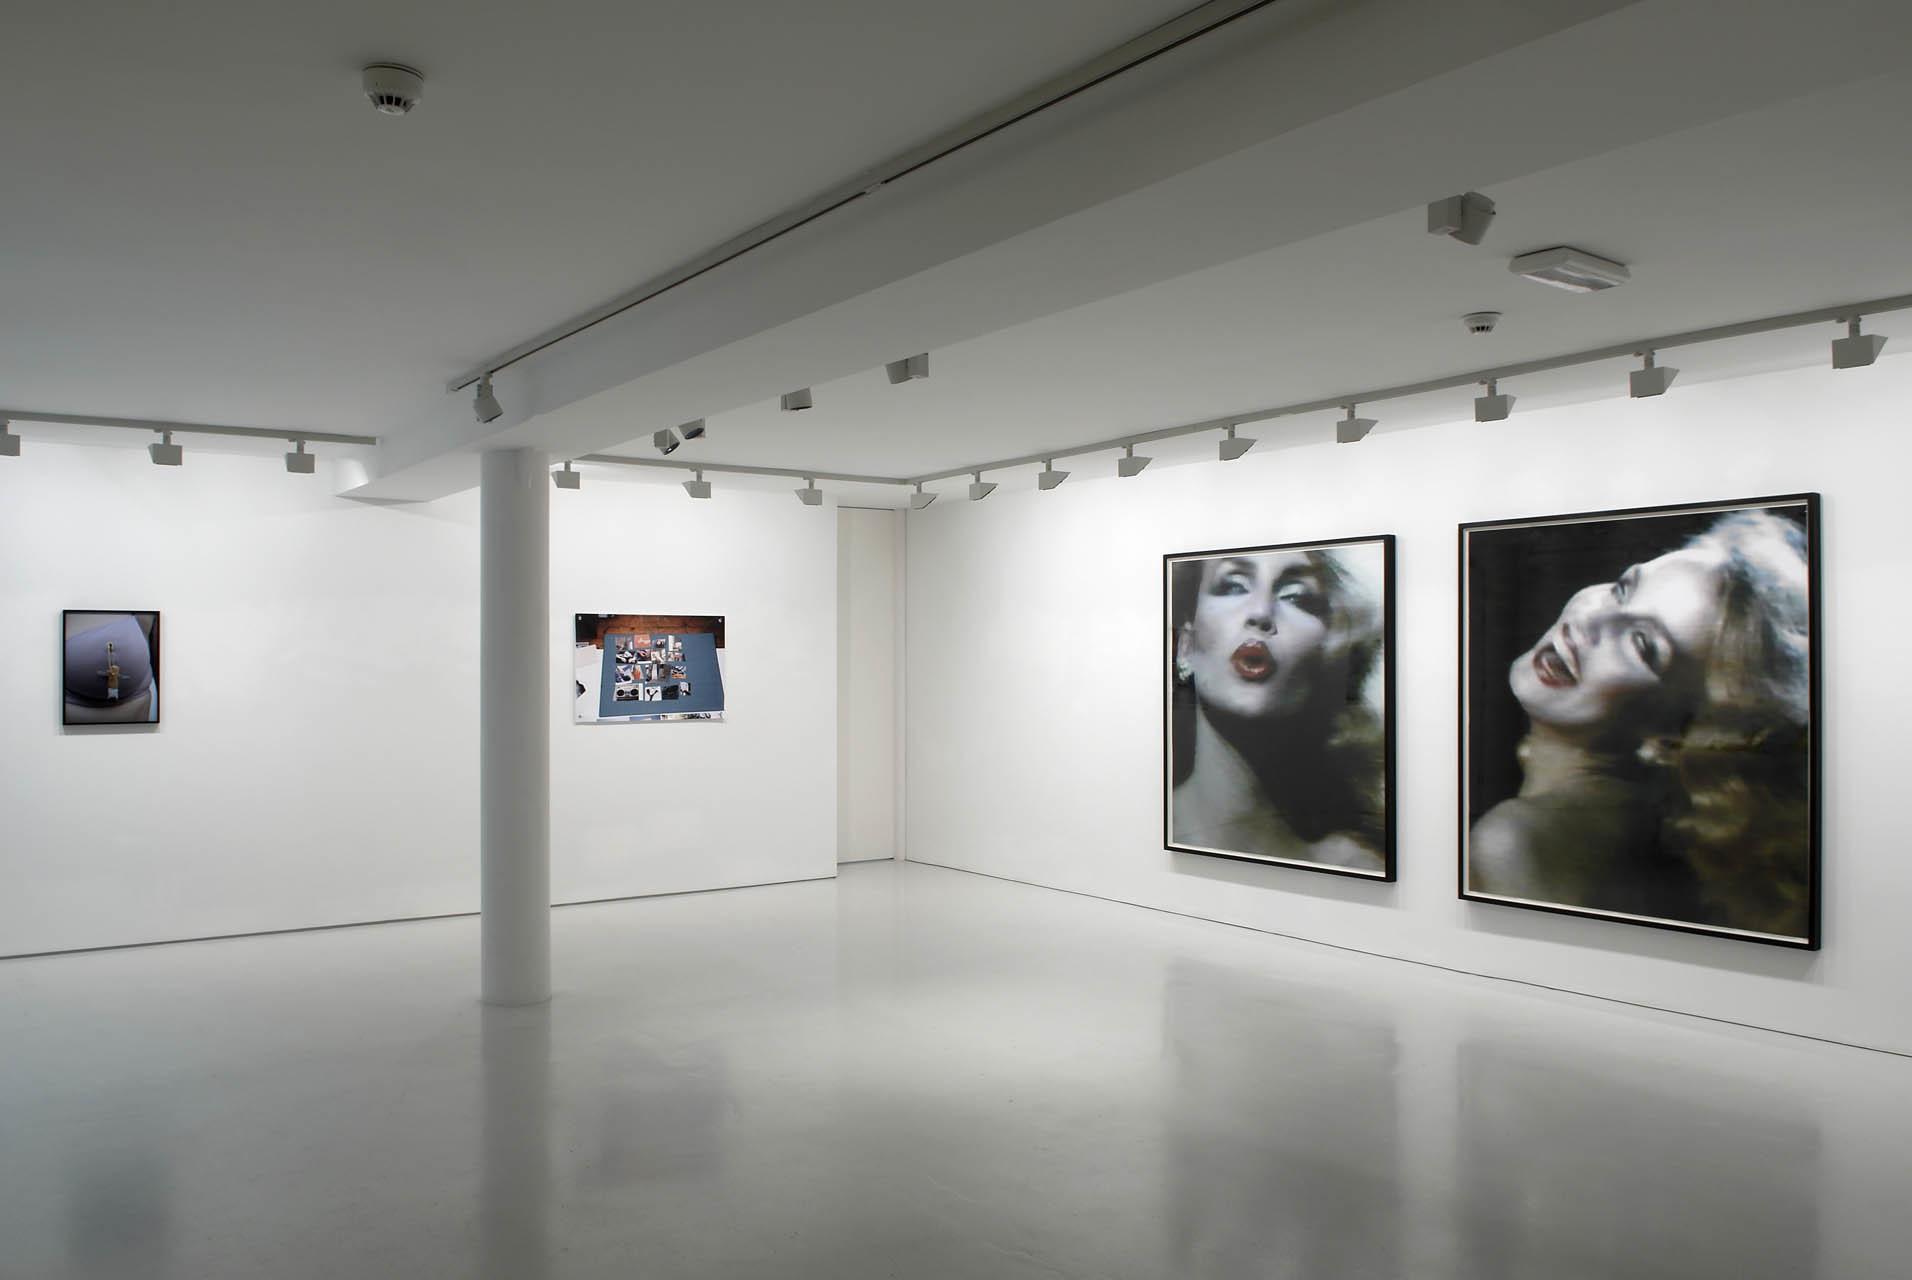 <p>Installation View, 2008</p>